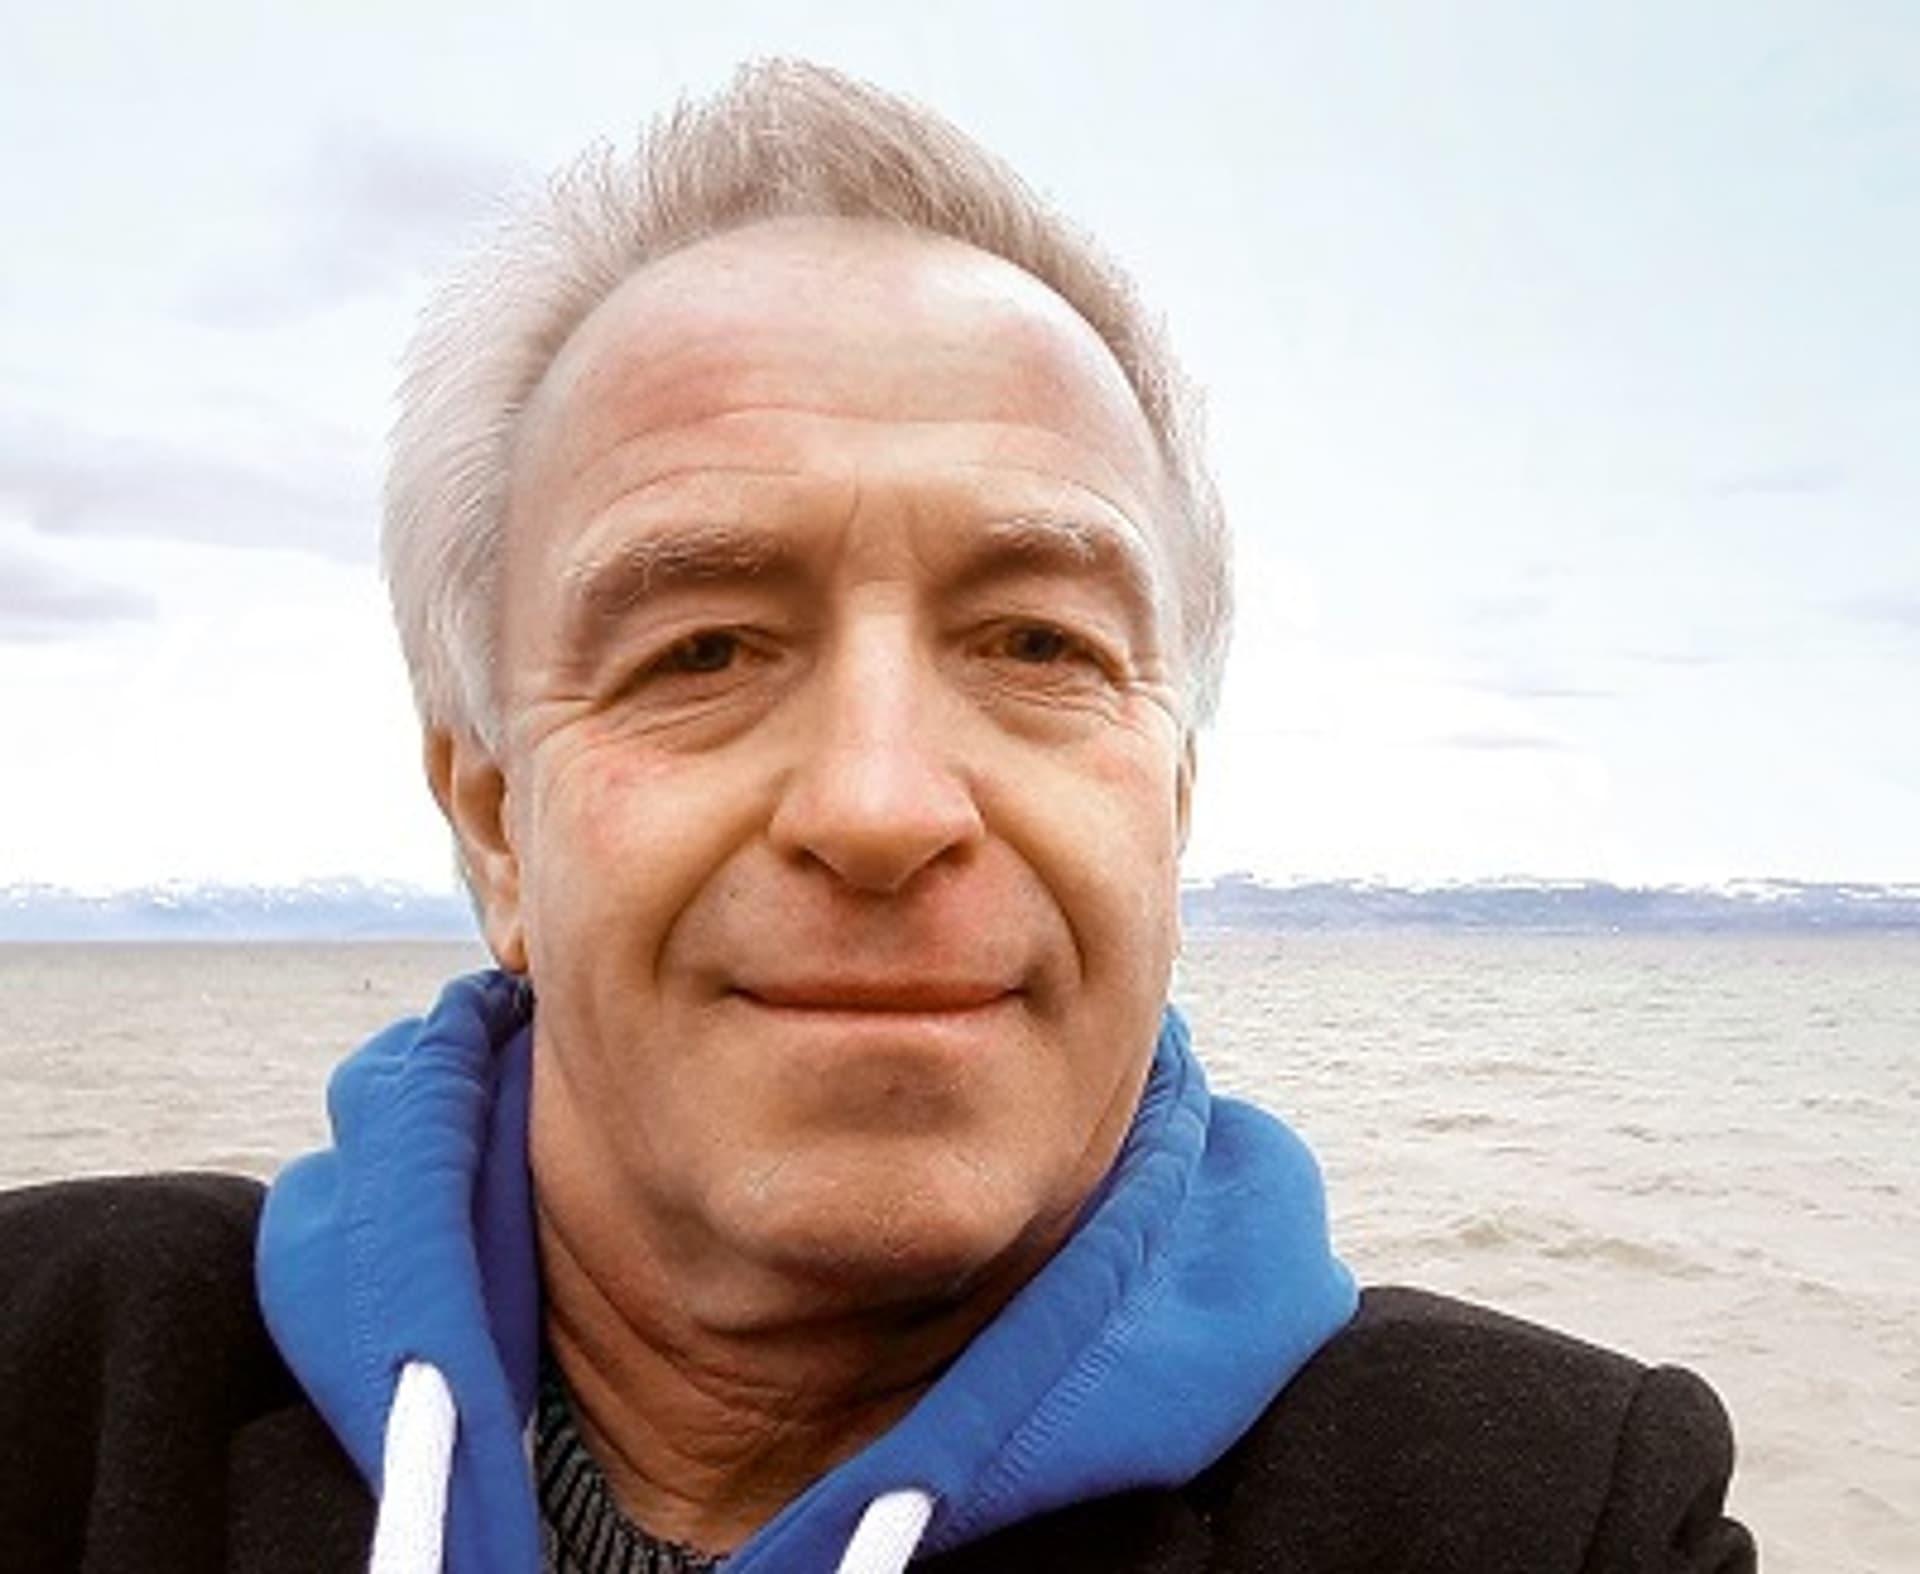 Peter Kossytorz